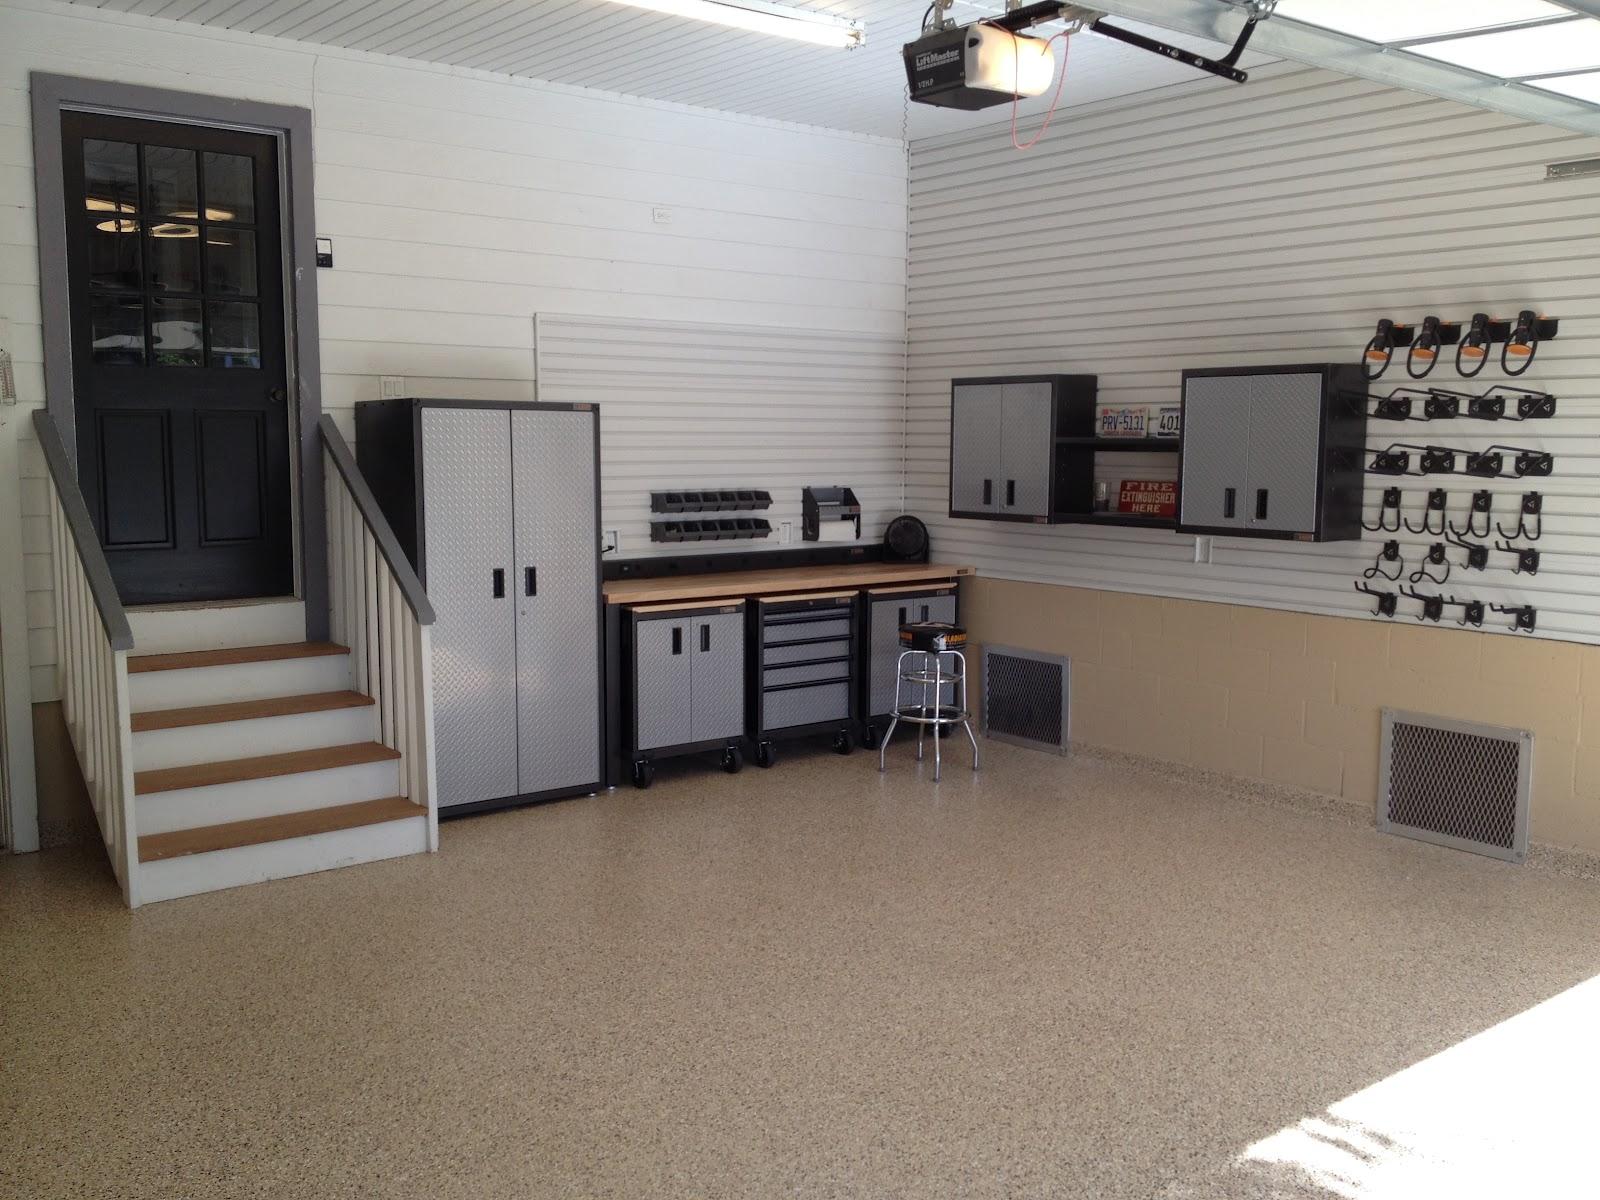 To Garage: The Garage Enhancement Company